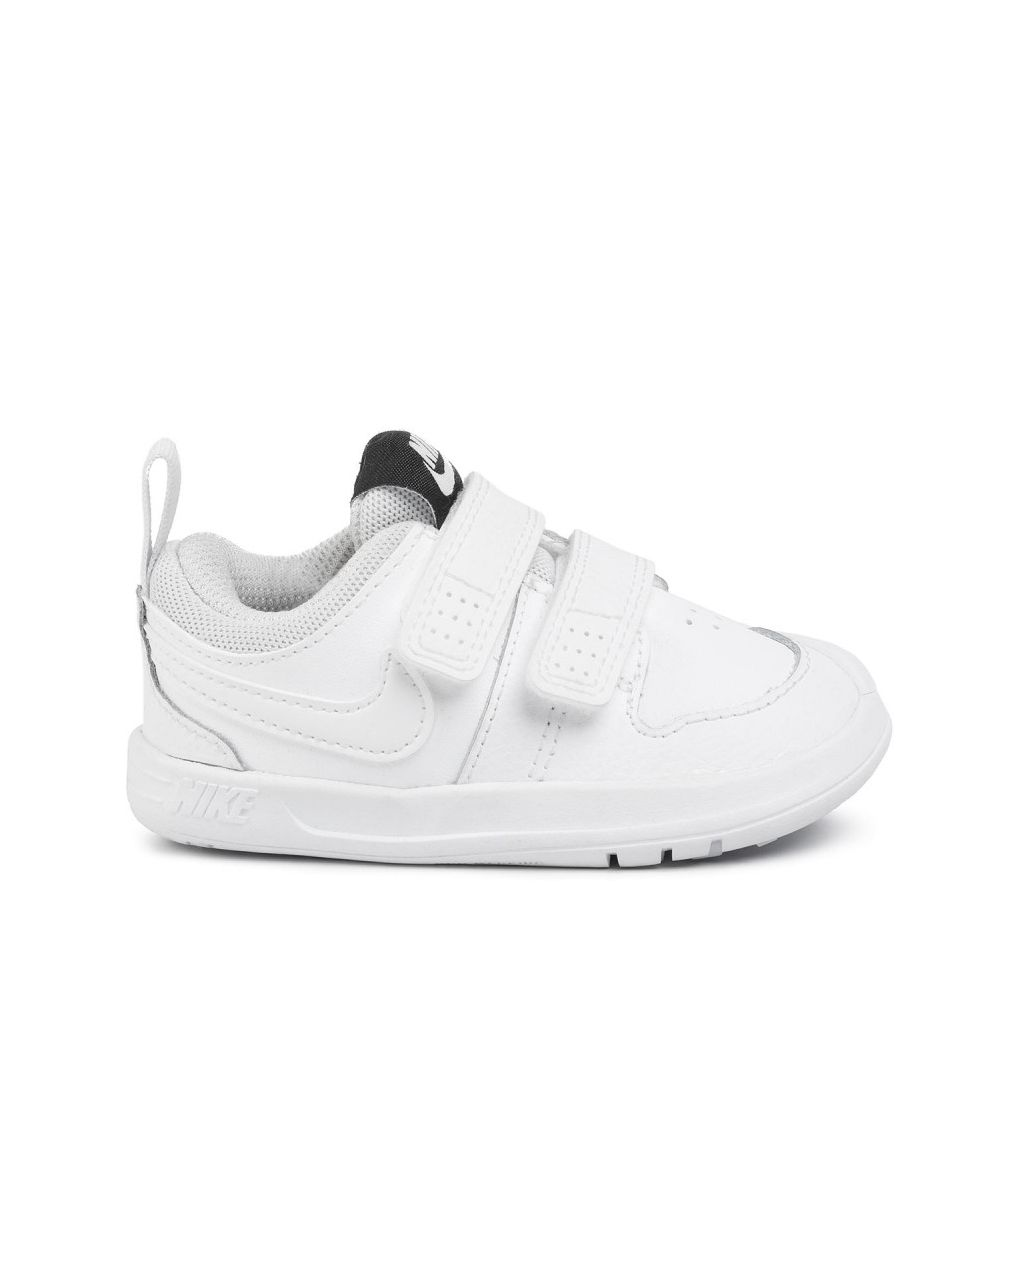 Nike pico 5 - Nike